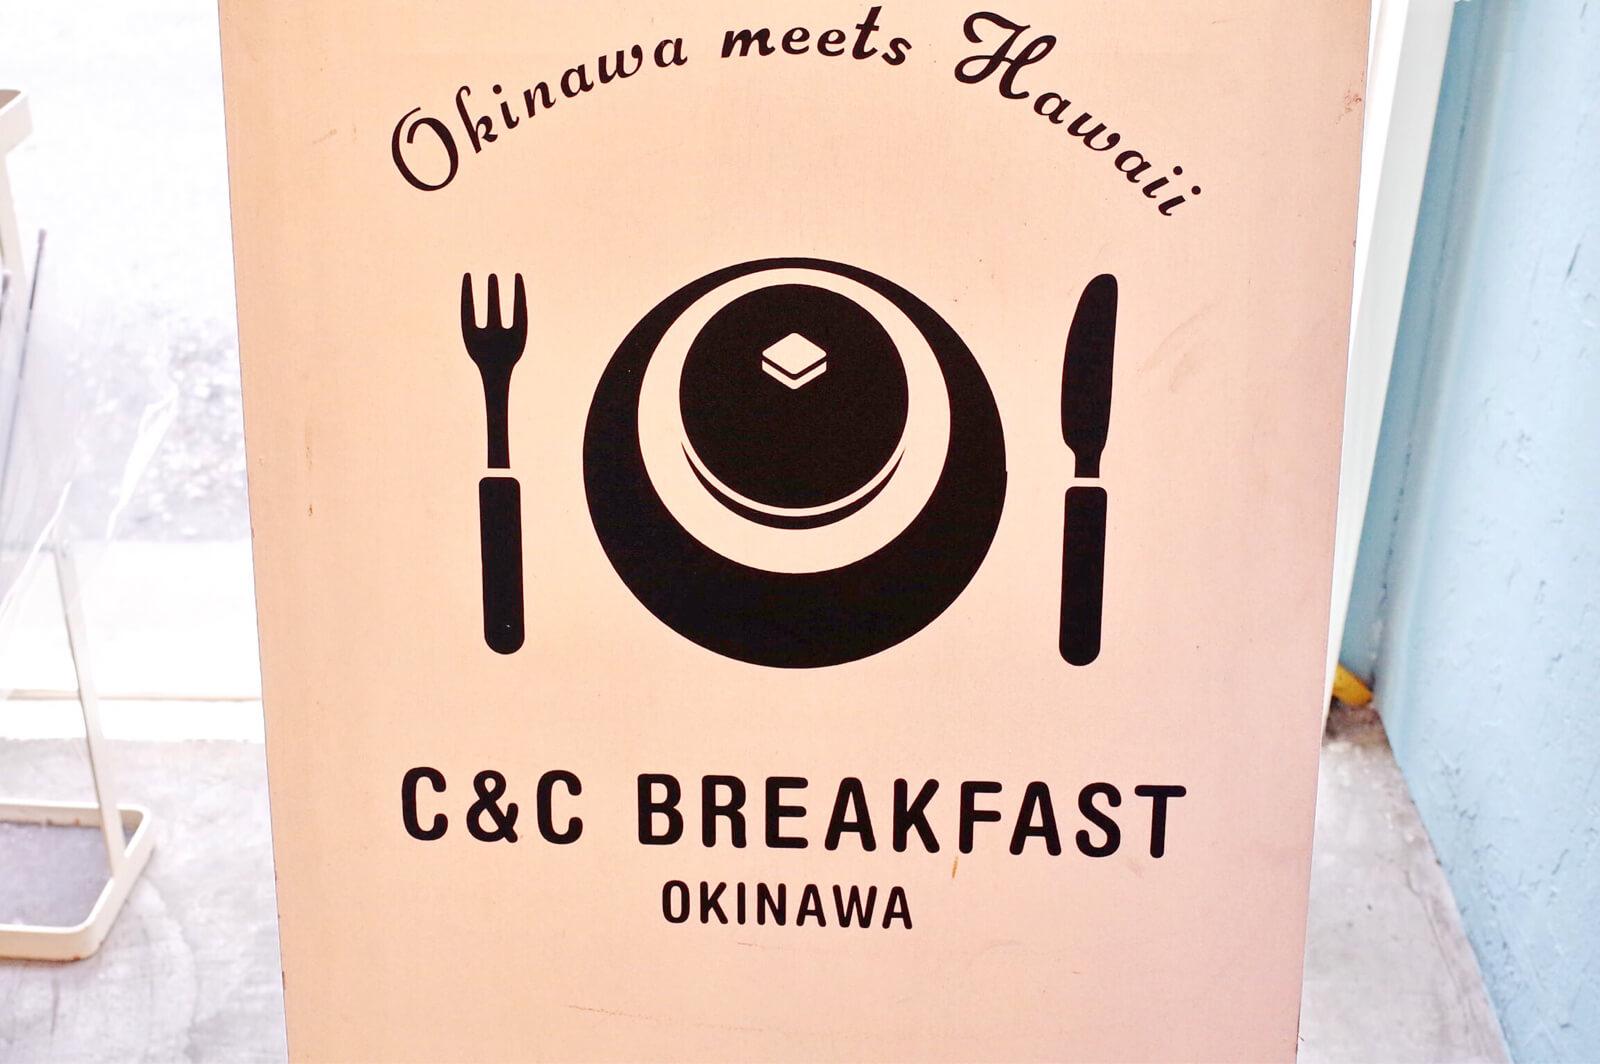 C&C BREAKFAST okinawa 看板